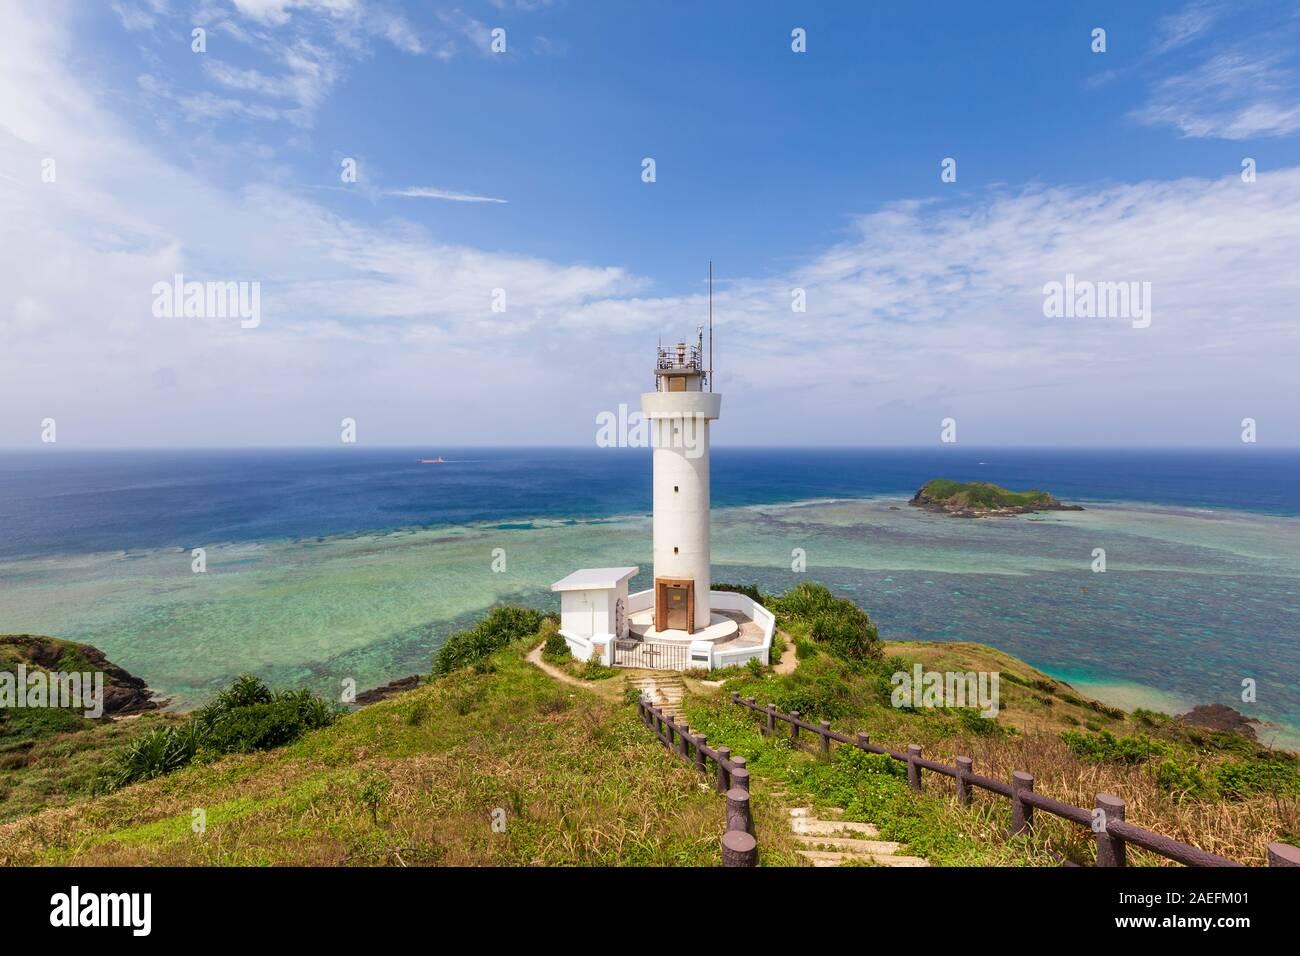 Hirakubo faro sull Isola di Ishigaki in Prefettura di Okinawa, in Giappone. Foto Stock